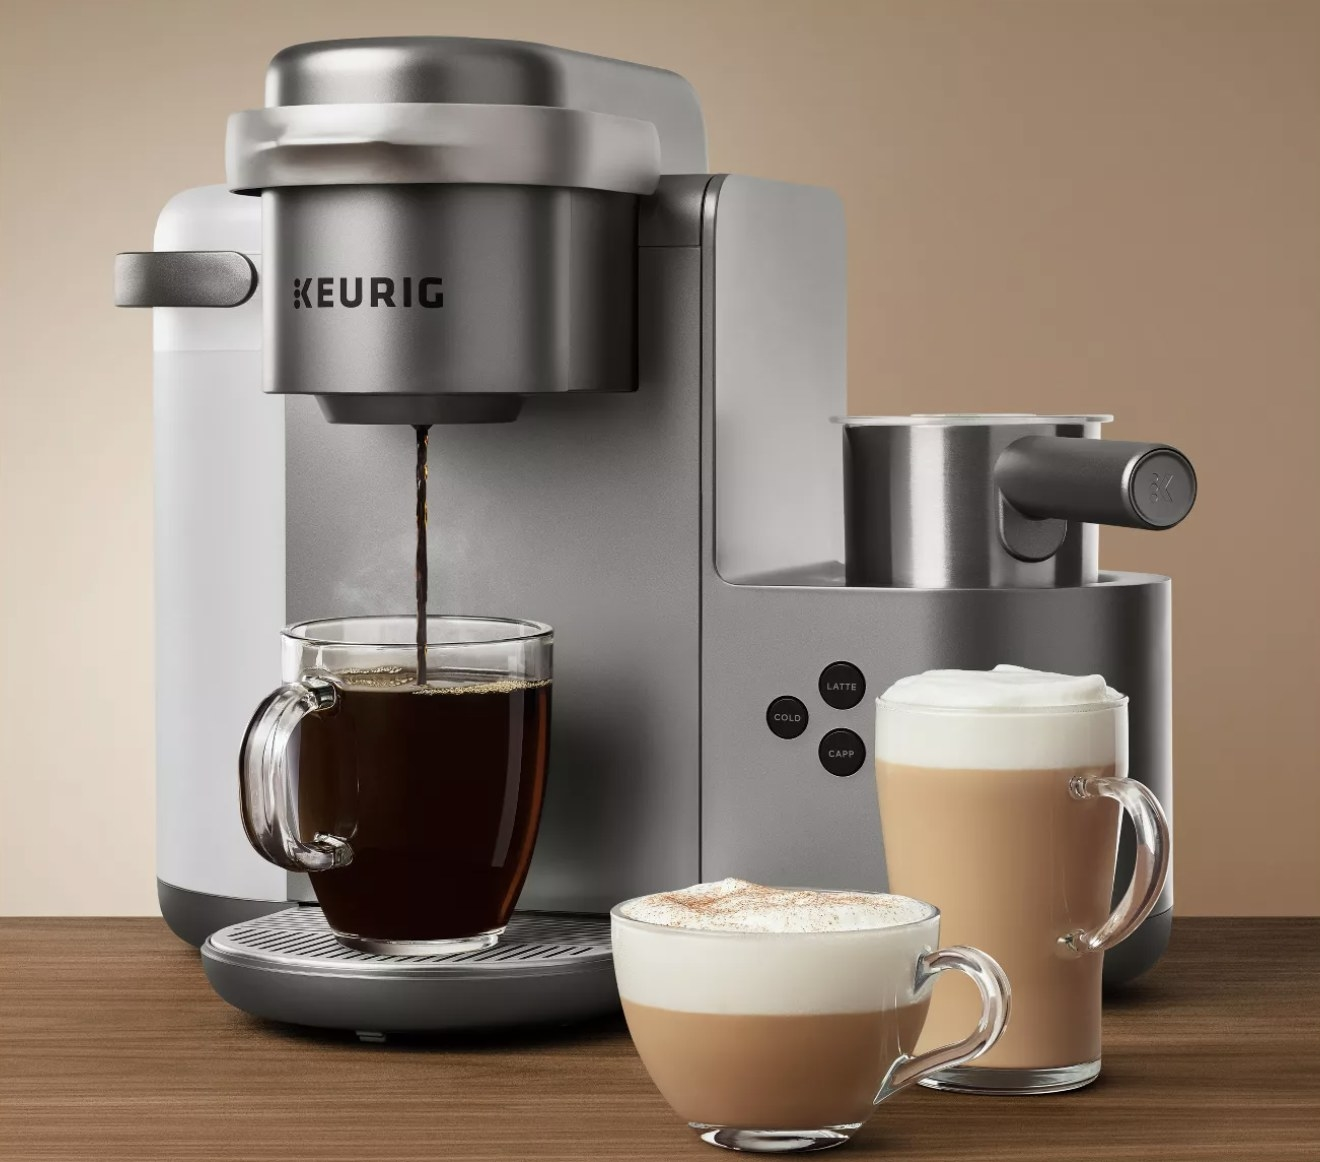 The Keurig pouring coffee into a glass mug